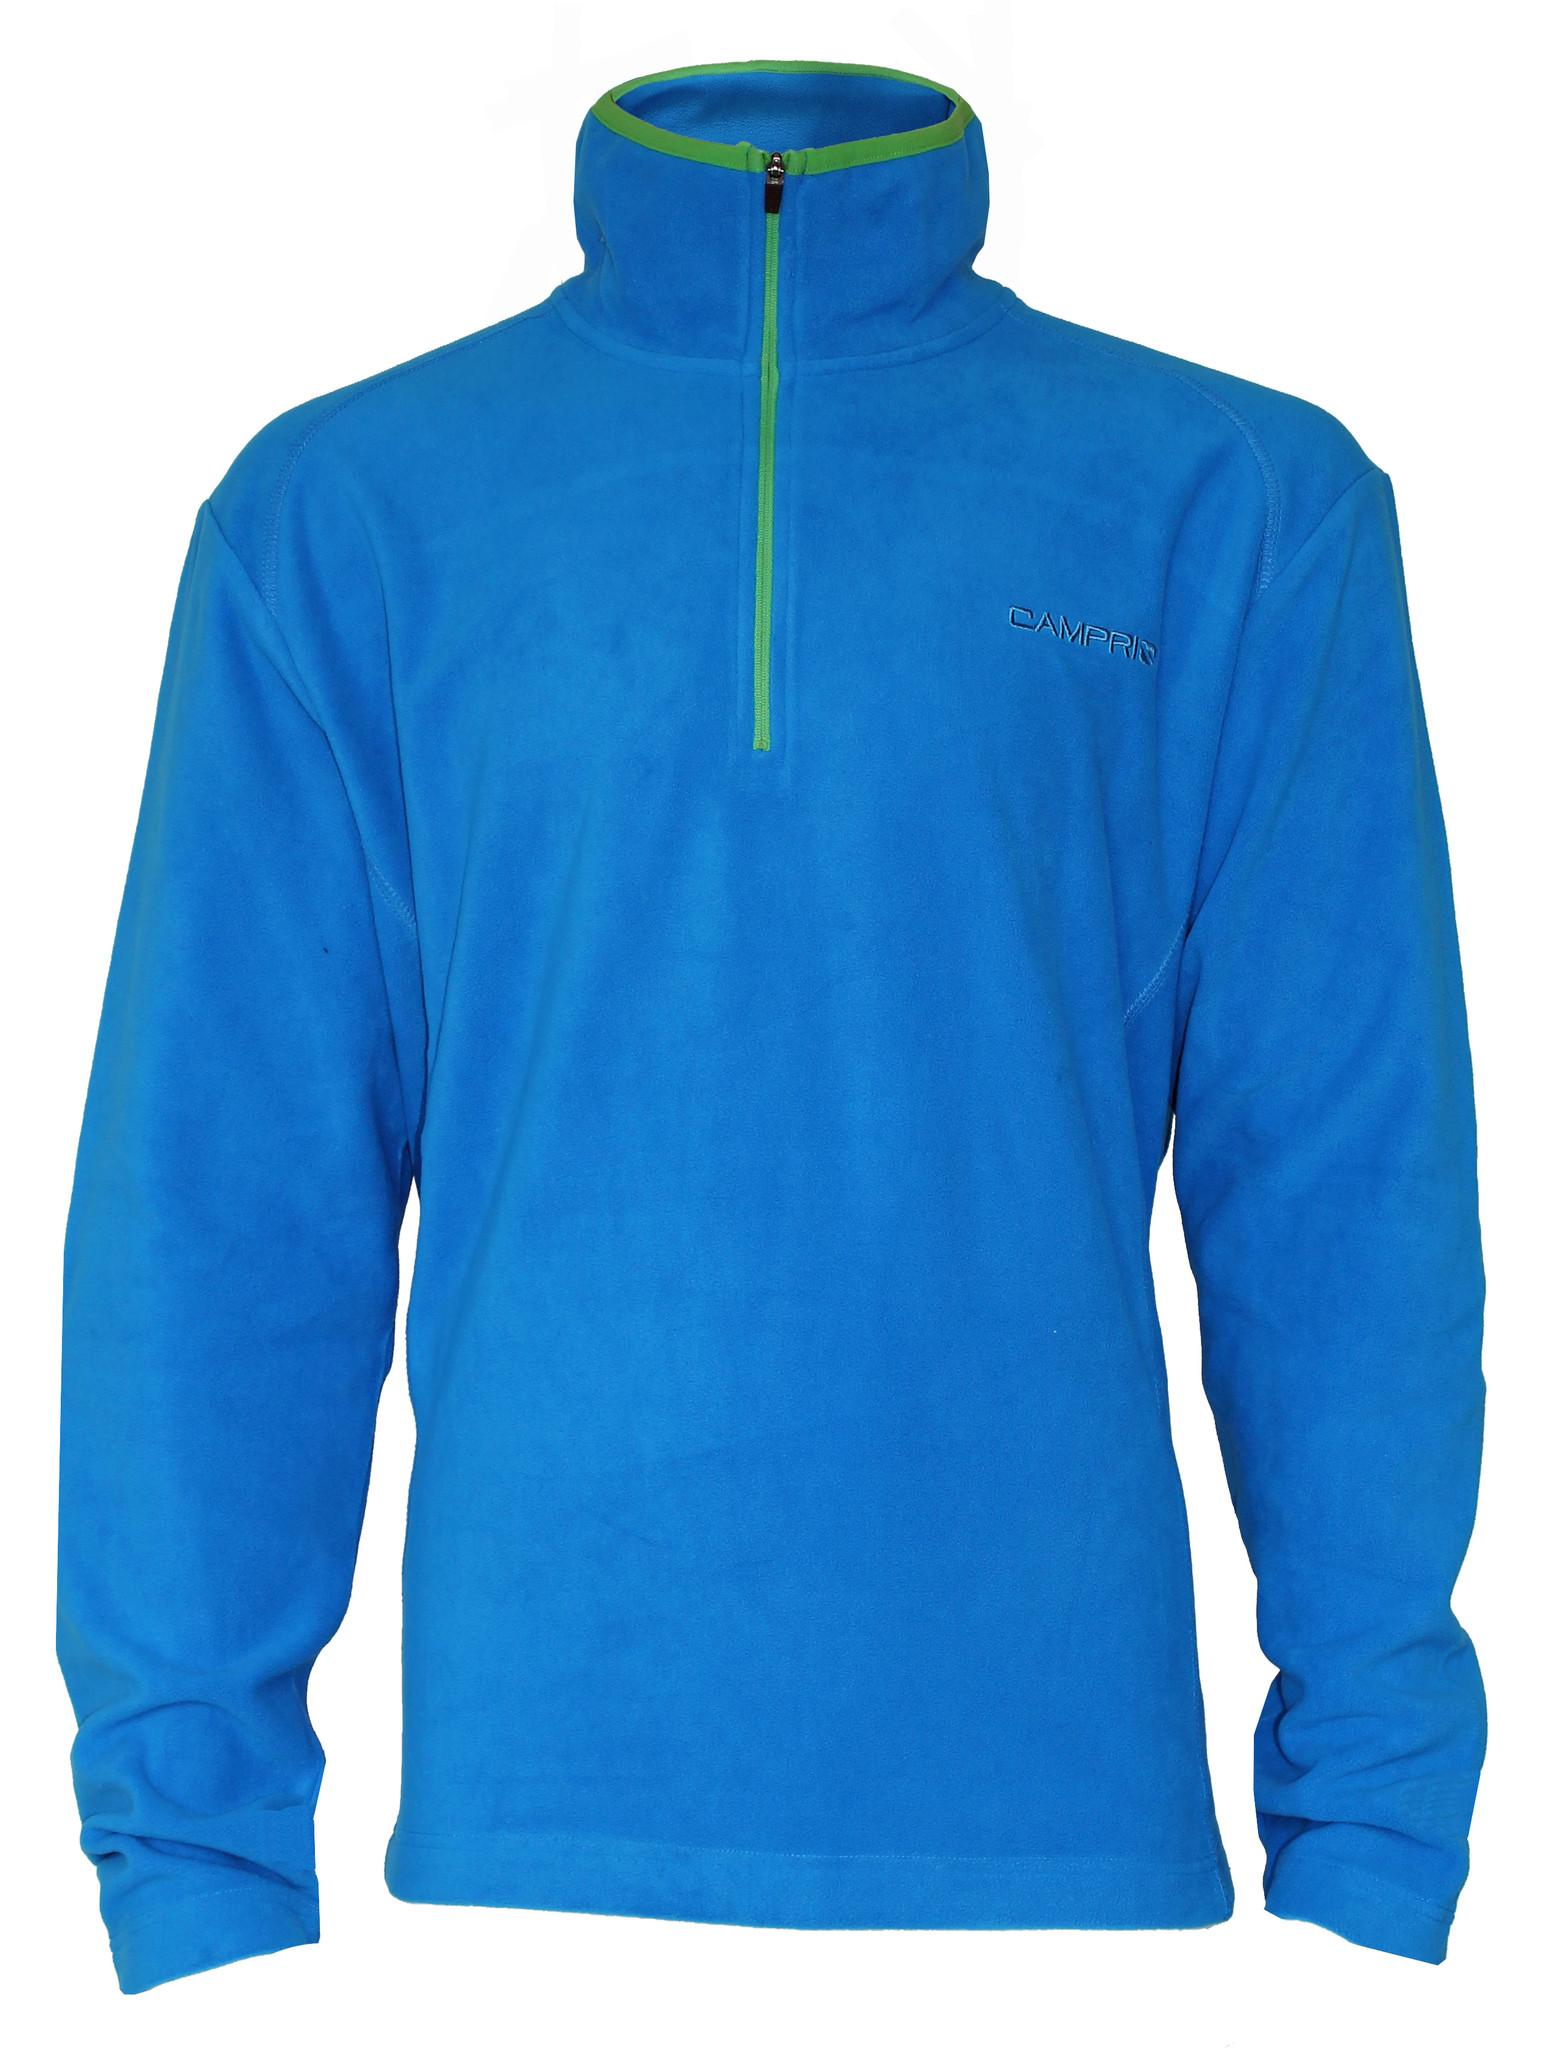 Campri Campri Heren - Micro Polar fleece sweater - Blauw